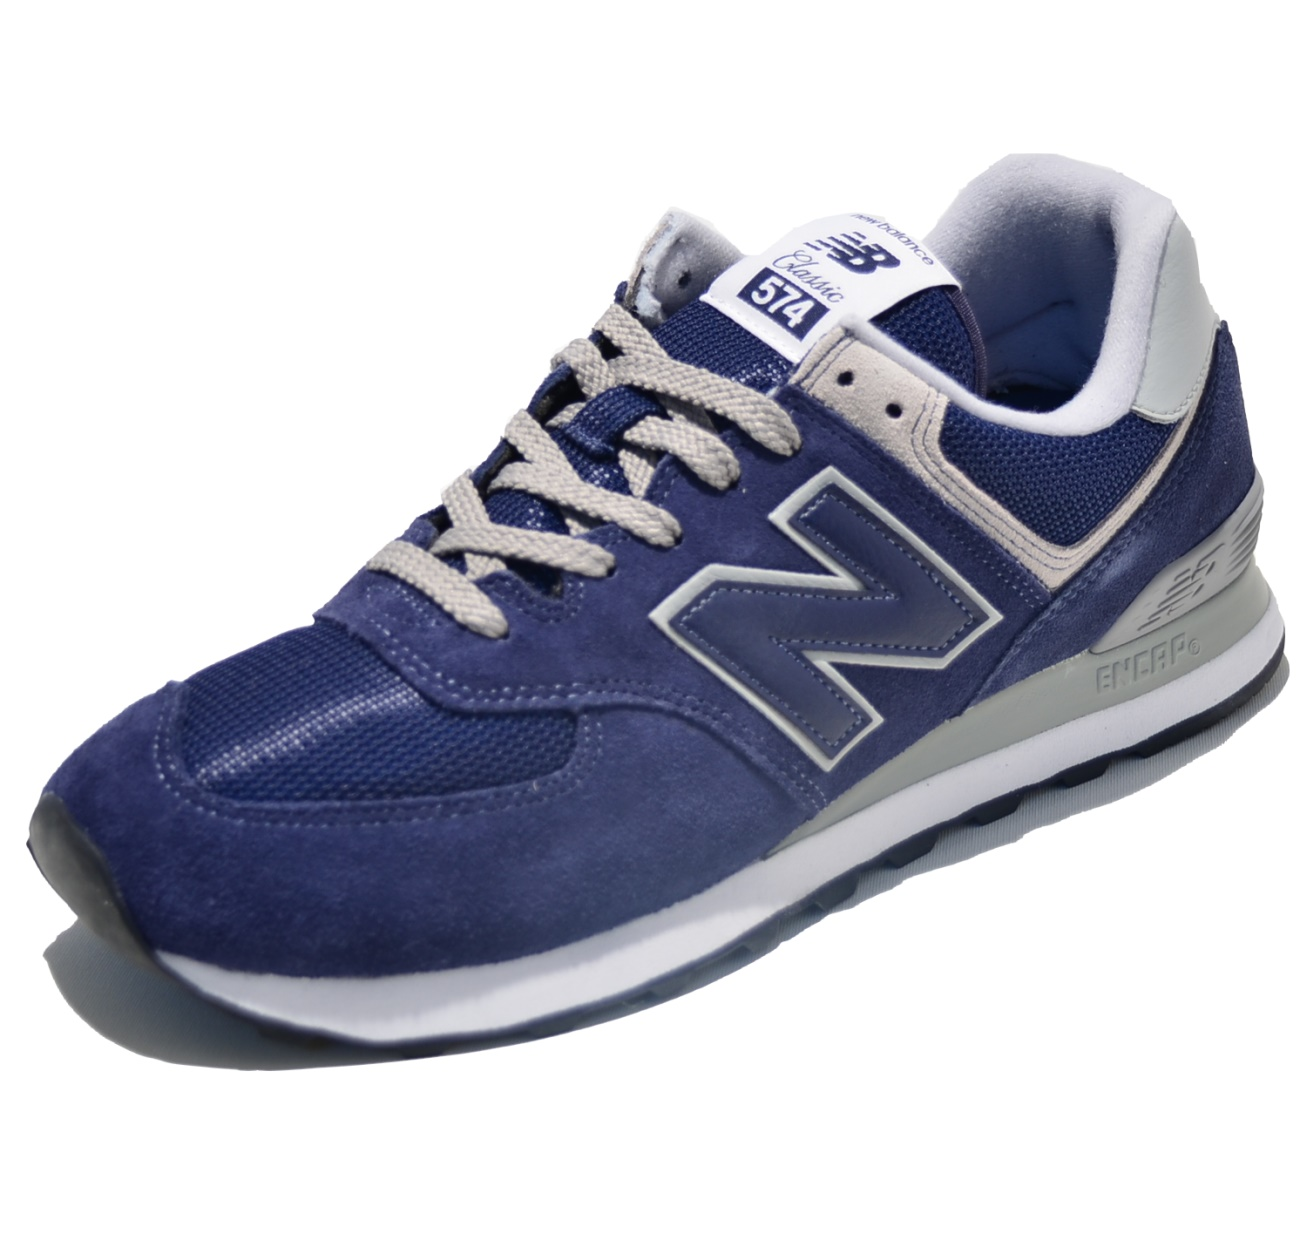 New Balance Classic Laufschuhe ML574EGN in Farbe dunkelblau New Balance bei Skinhead Shop